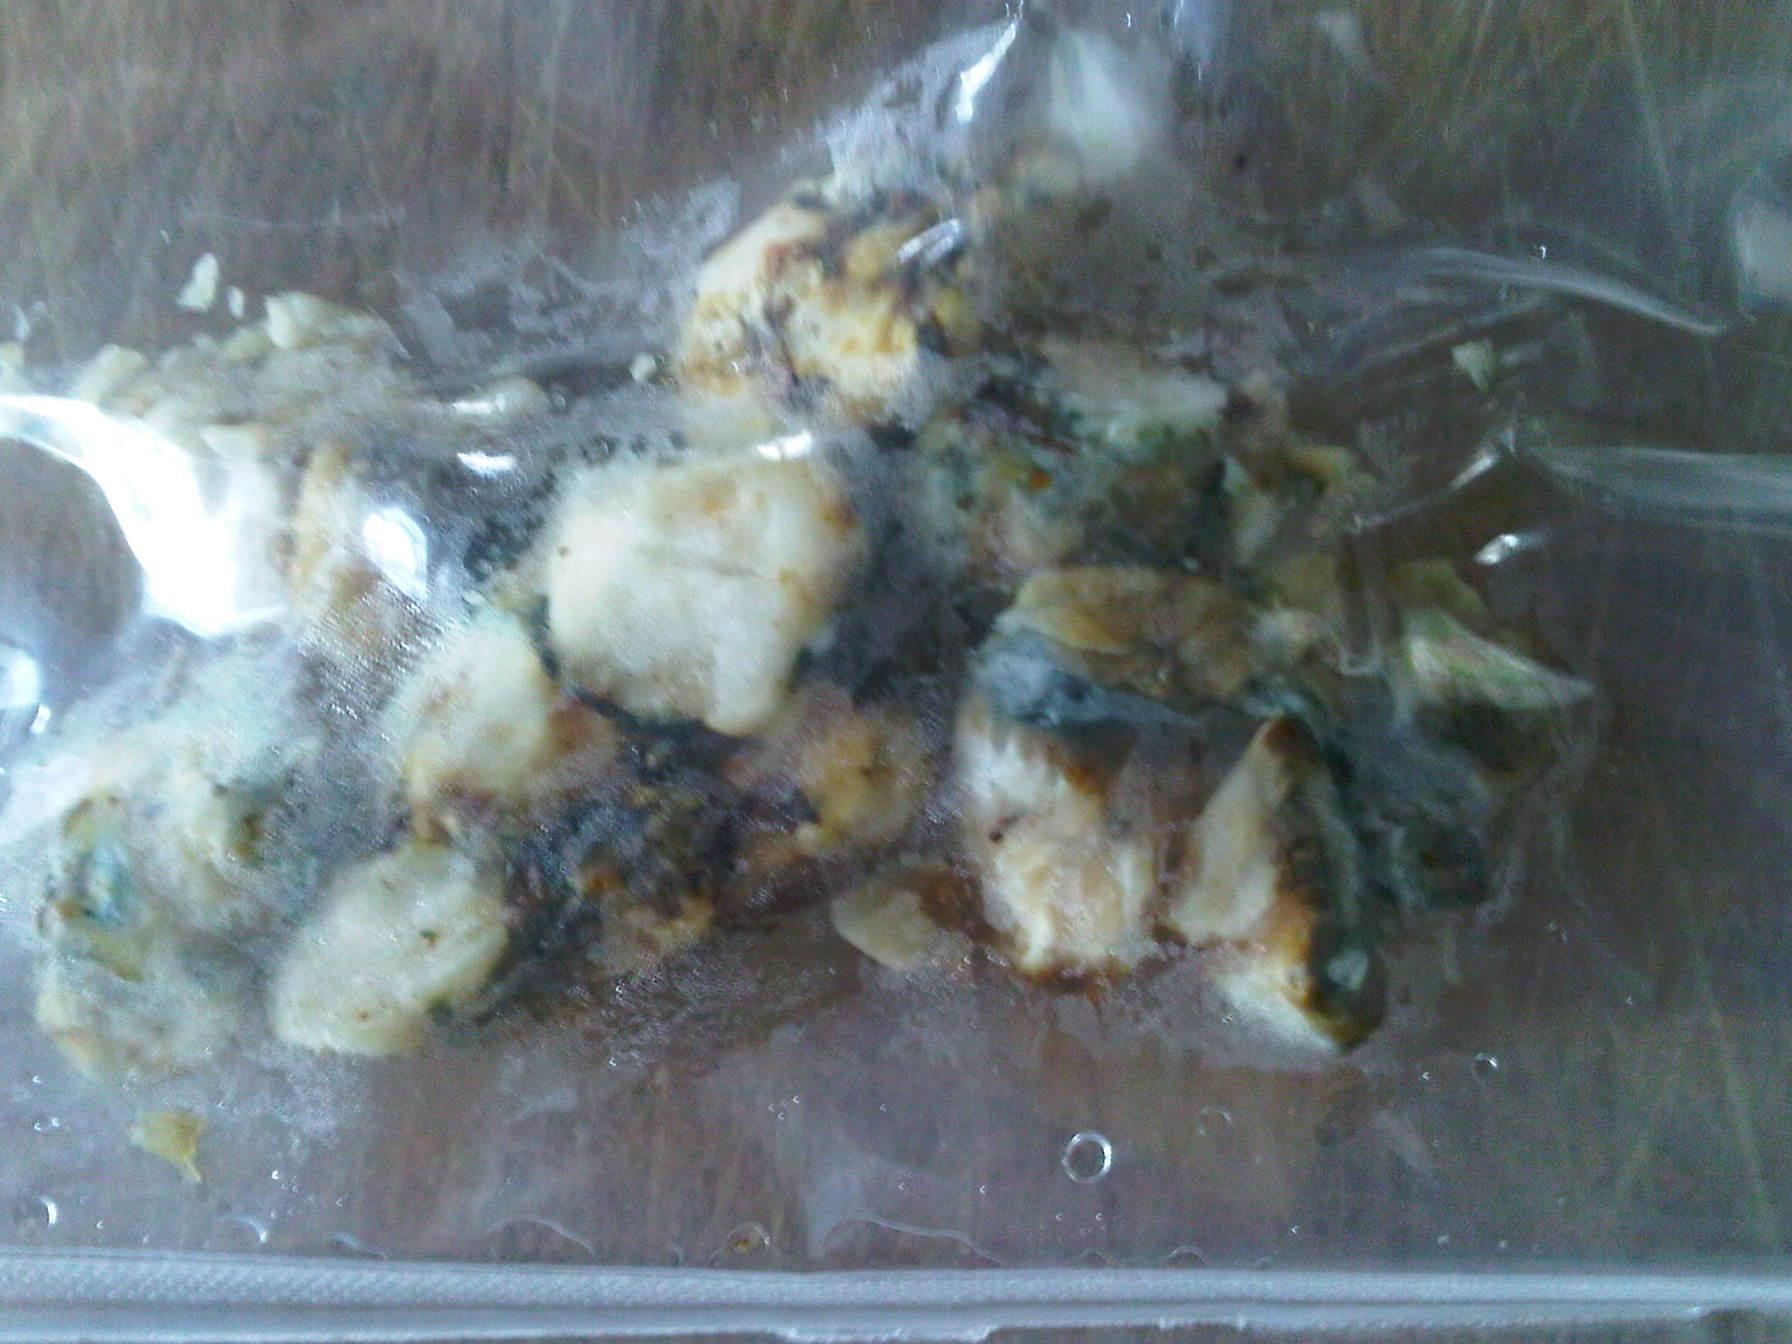 Green mould spots on Magic Truffles - Contamination Forum